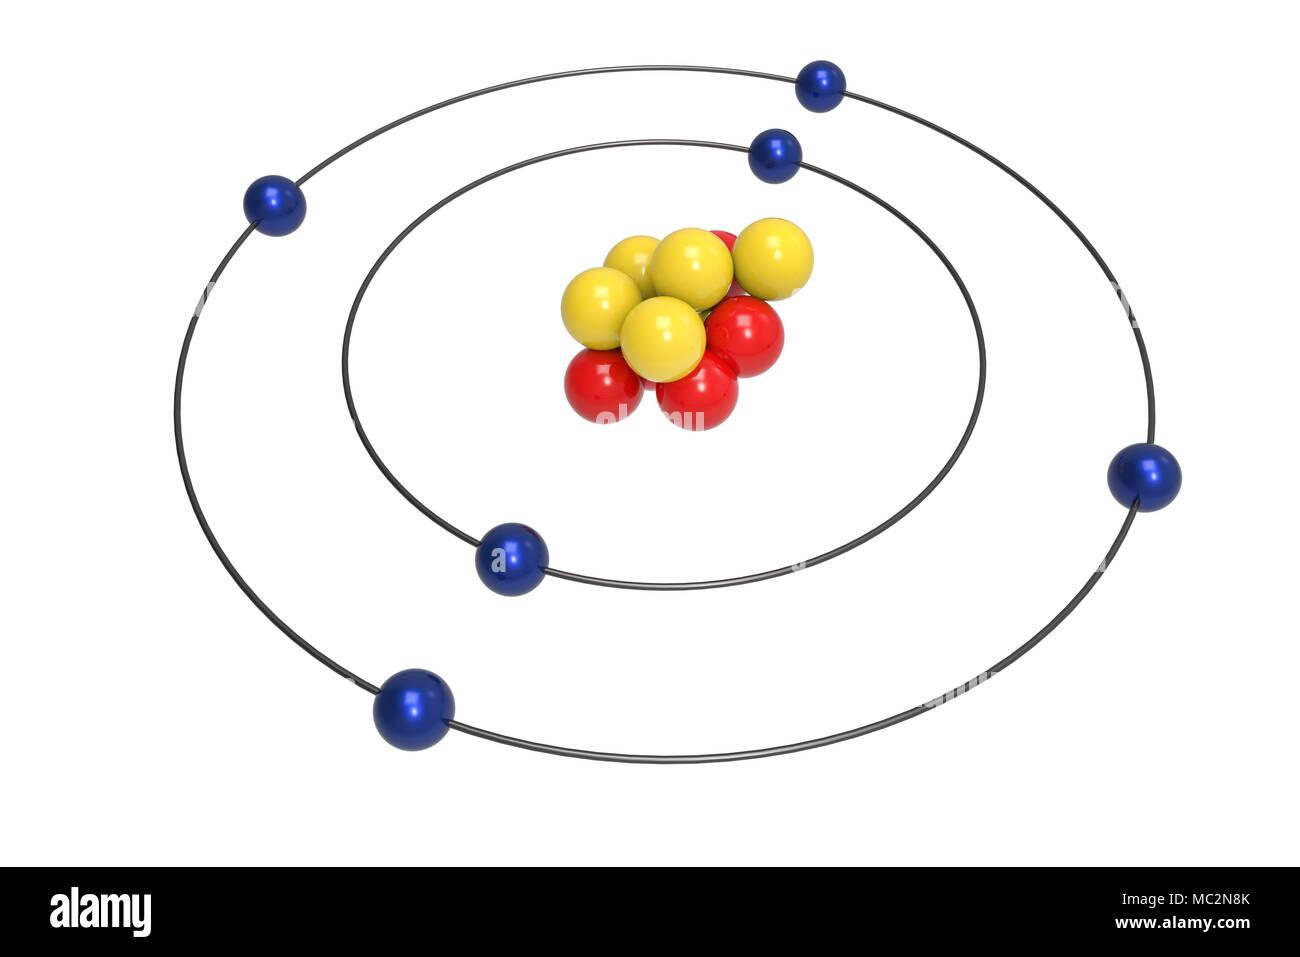 Carbon 3d diagram residential electrical symbols bohr model of carbon atom with proton neutron and electron science rh alamy com carbon dot diagram magnesium diagram ccuart Images